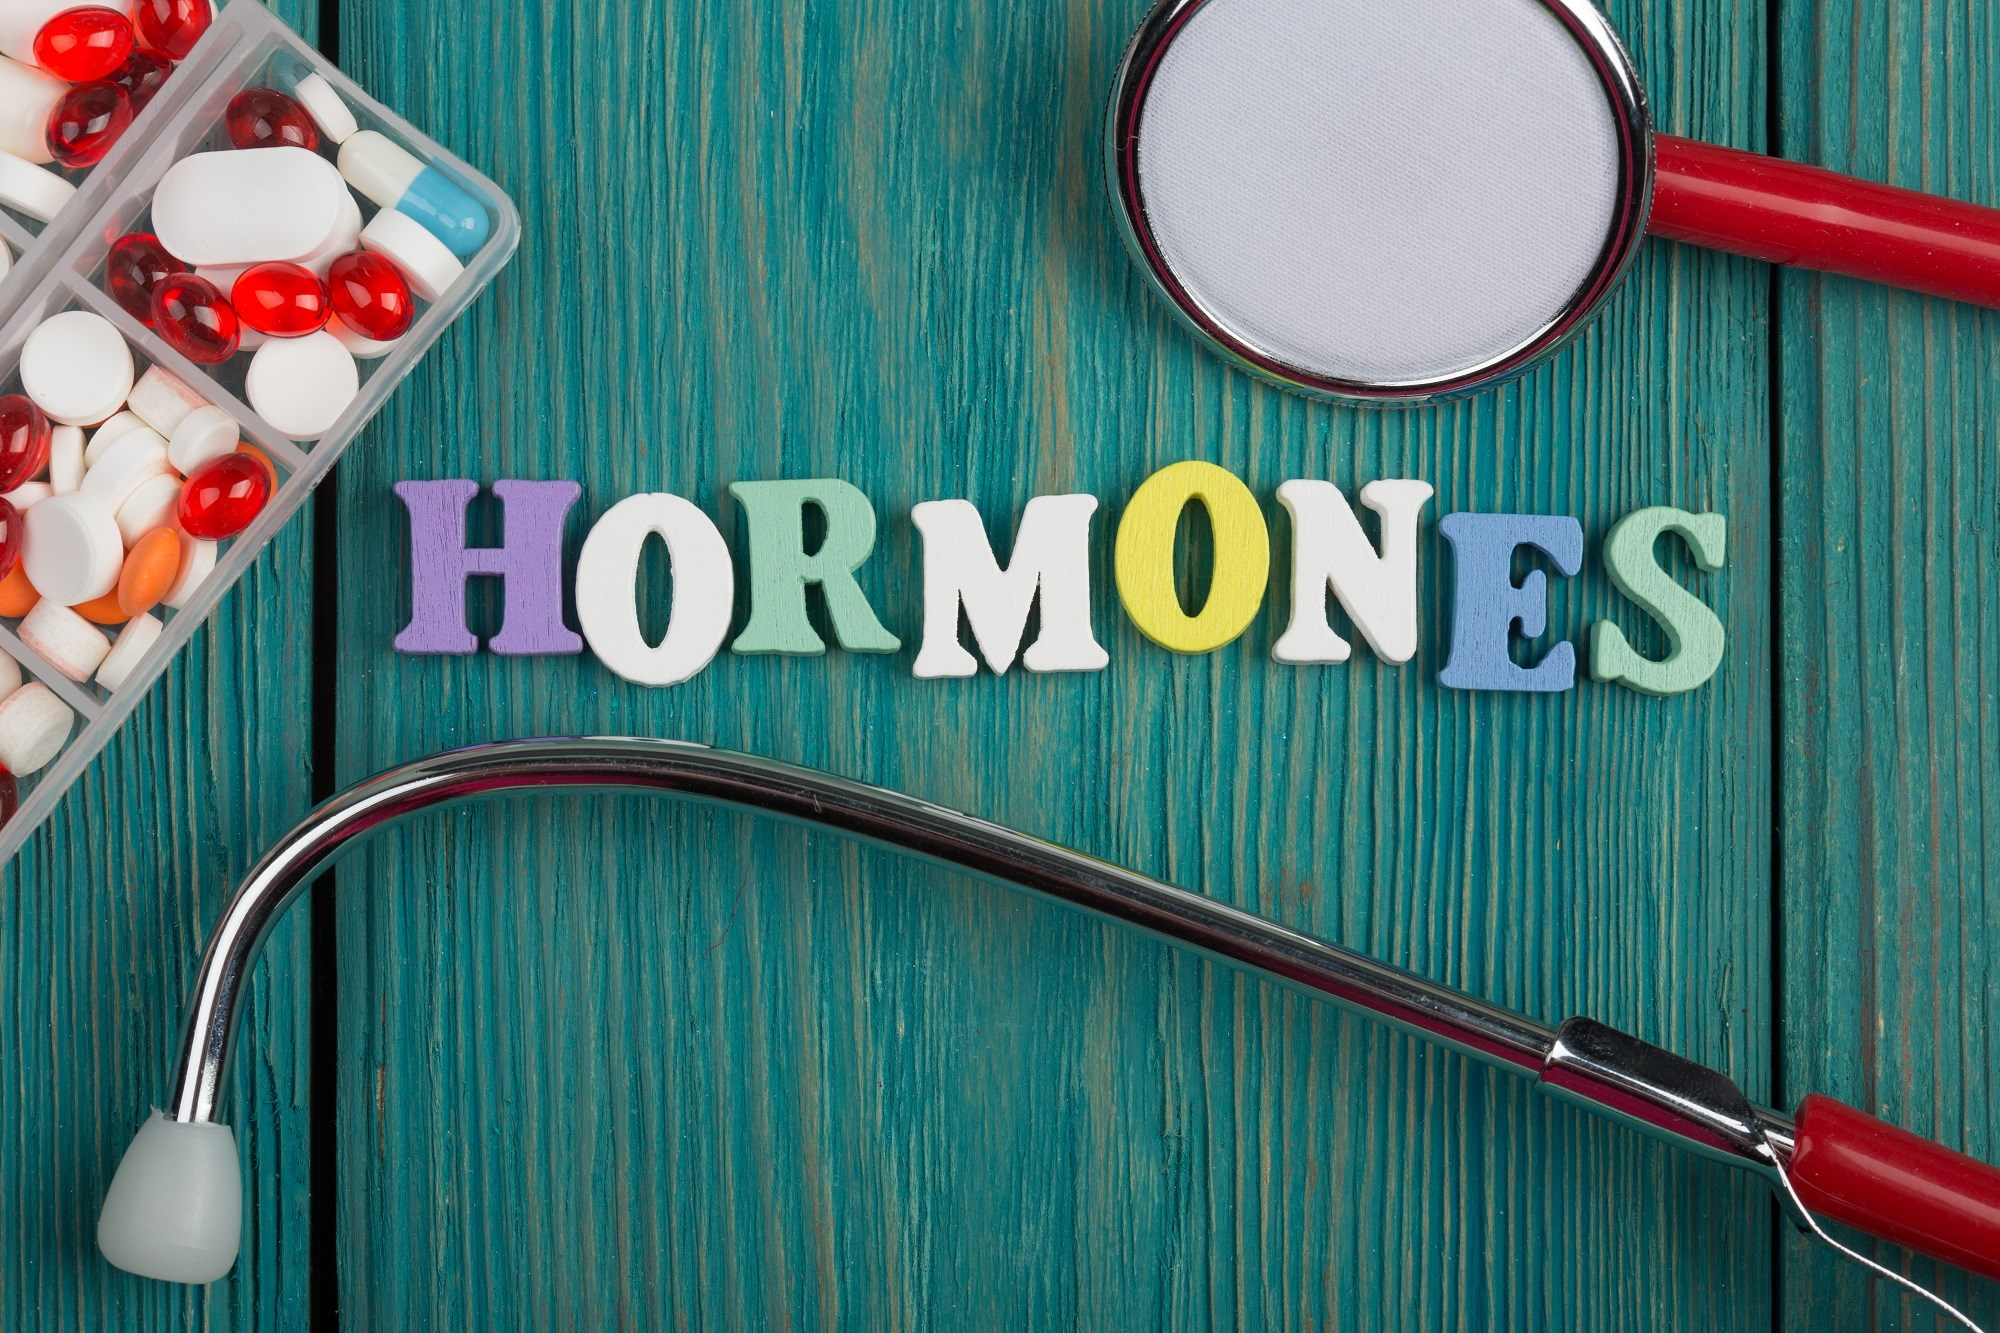 Migraine was found to be 3.25-fold more prevalent in women vs men.